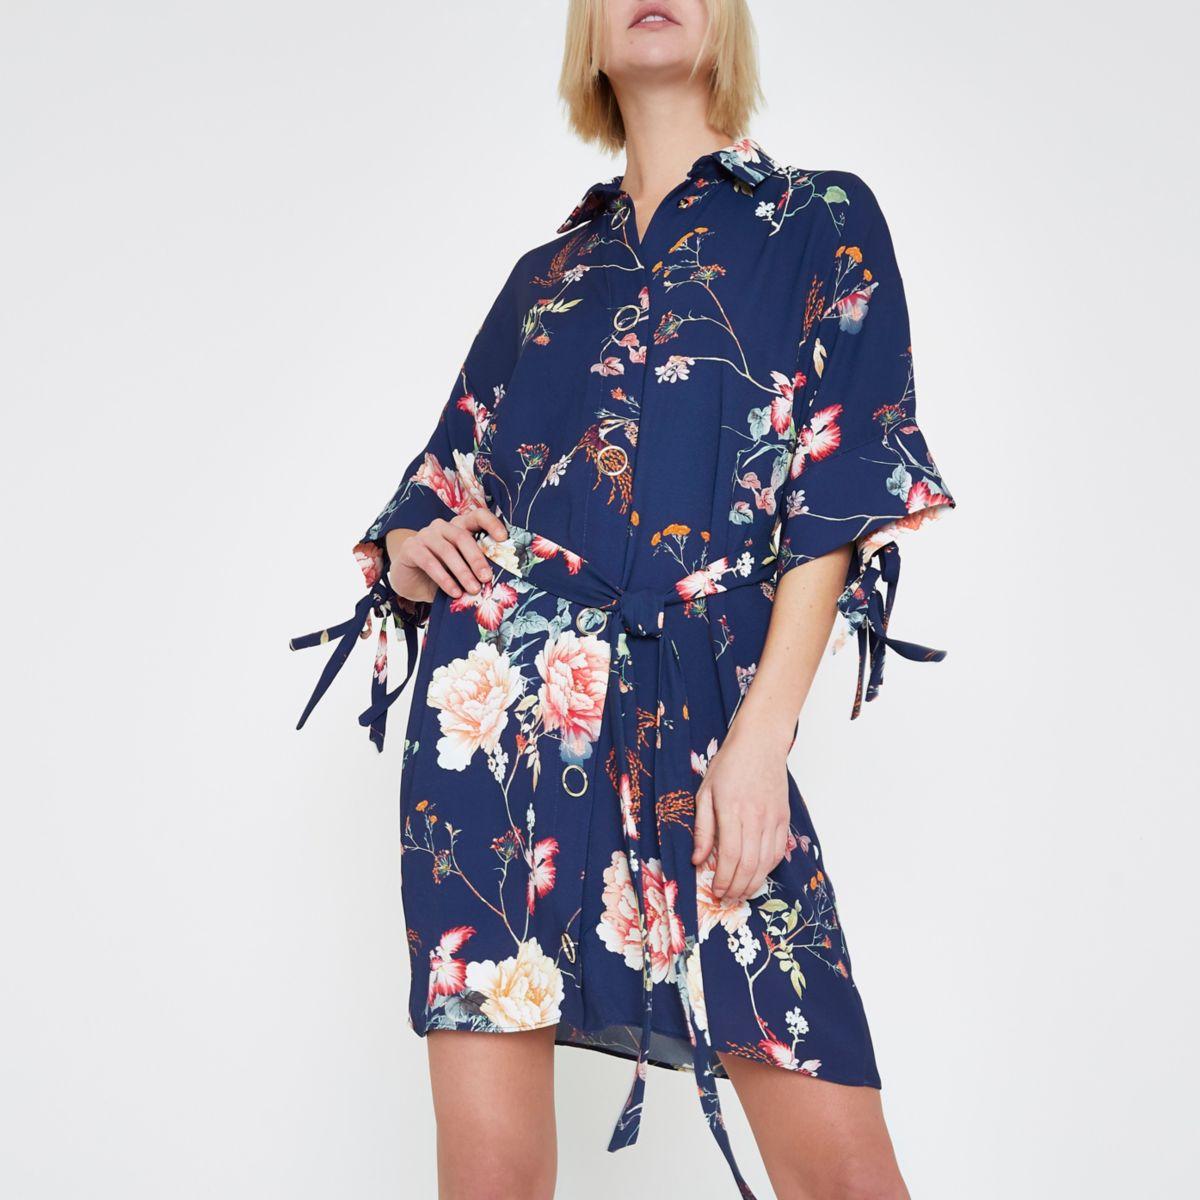 Blue floral tie sleeve shirt dress